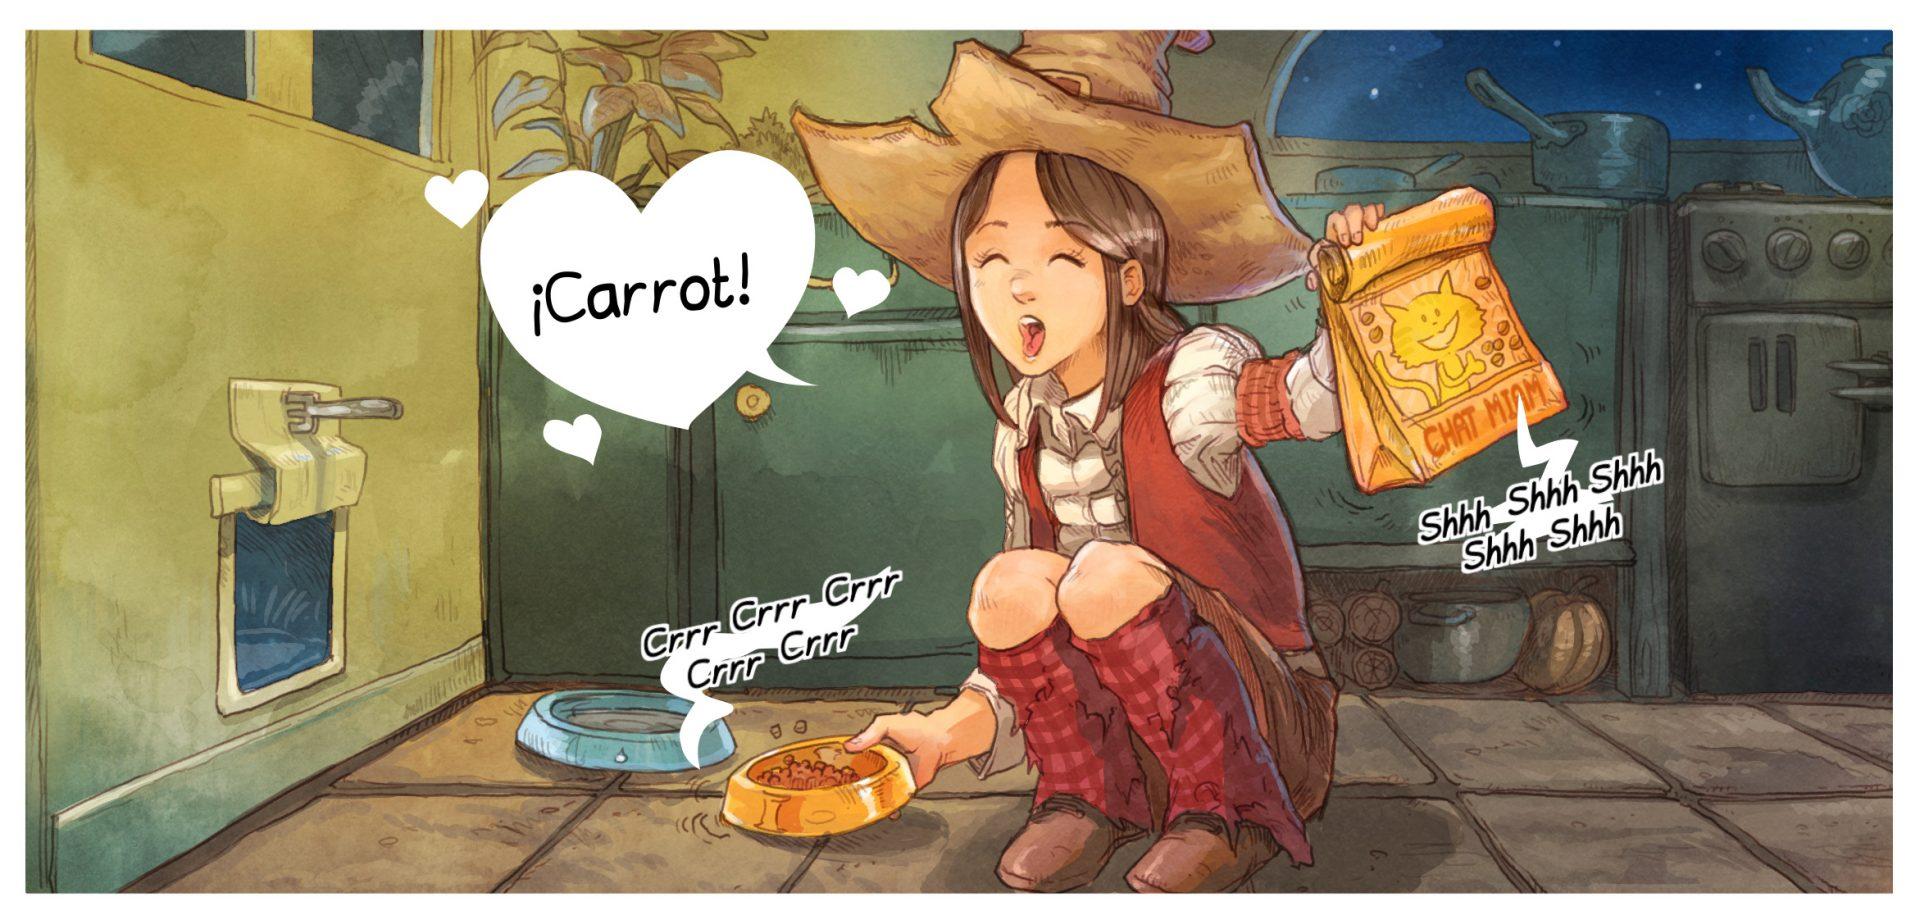 Pepper_Carrot_esp_04_04